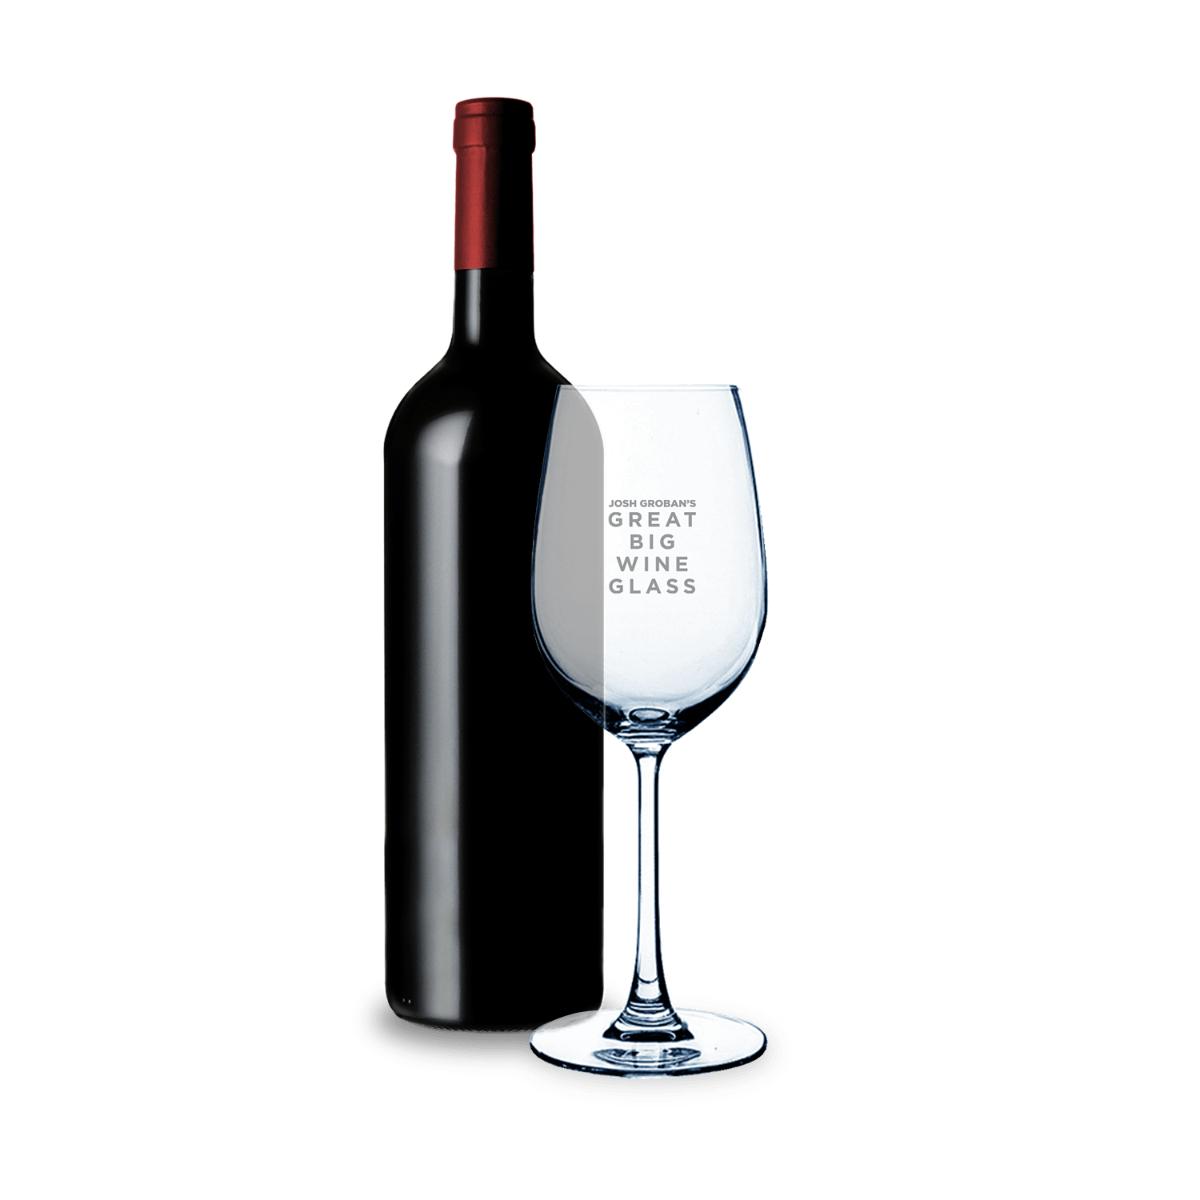 Josh Groban's Great Big Wine Glass